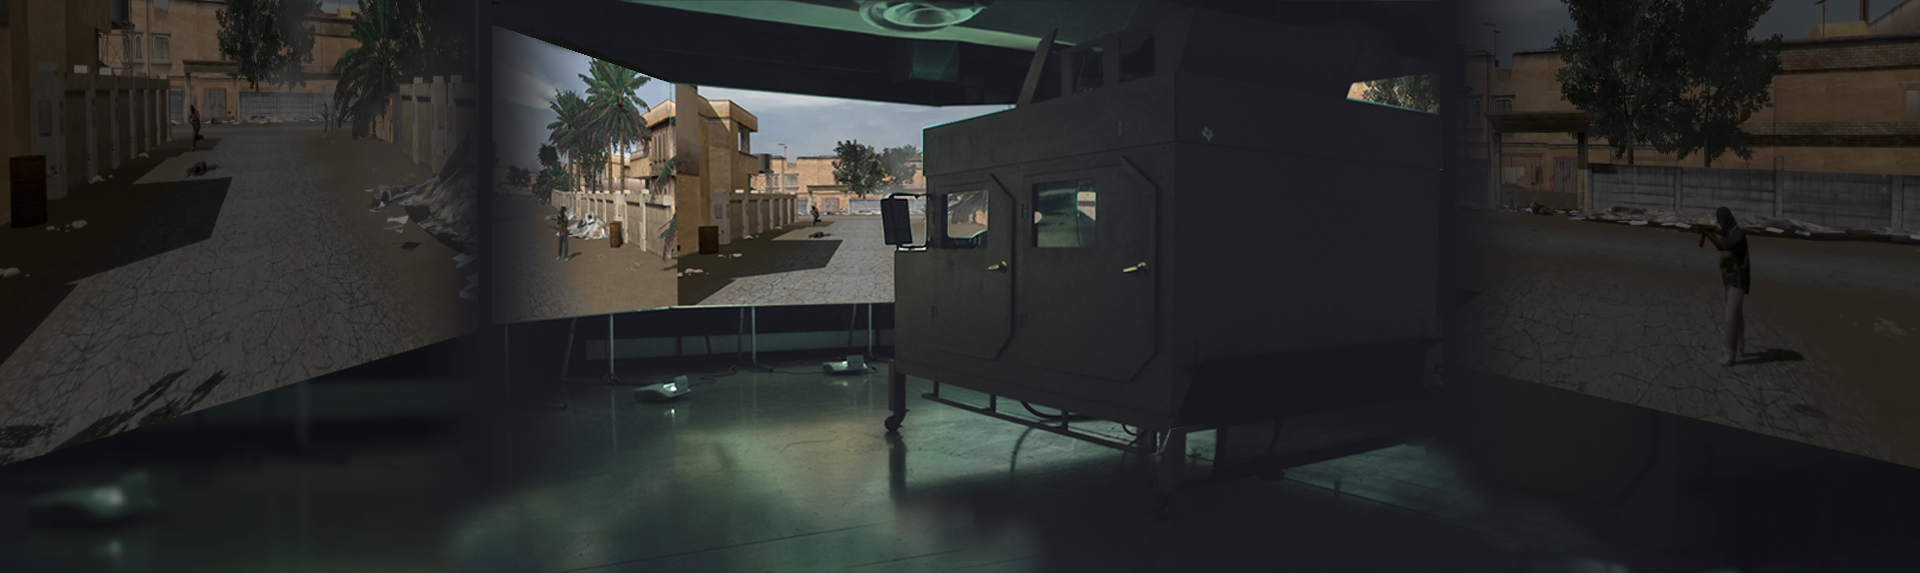 Humvee_1920_Final2